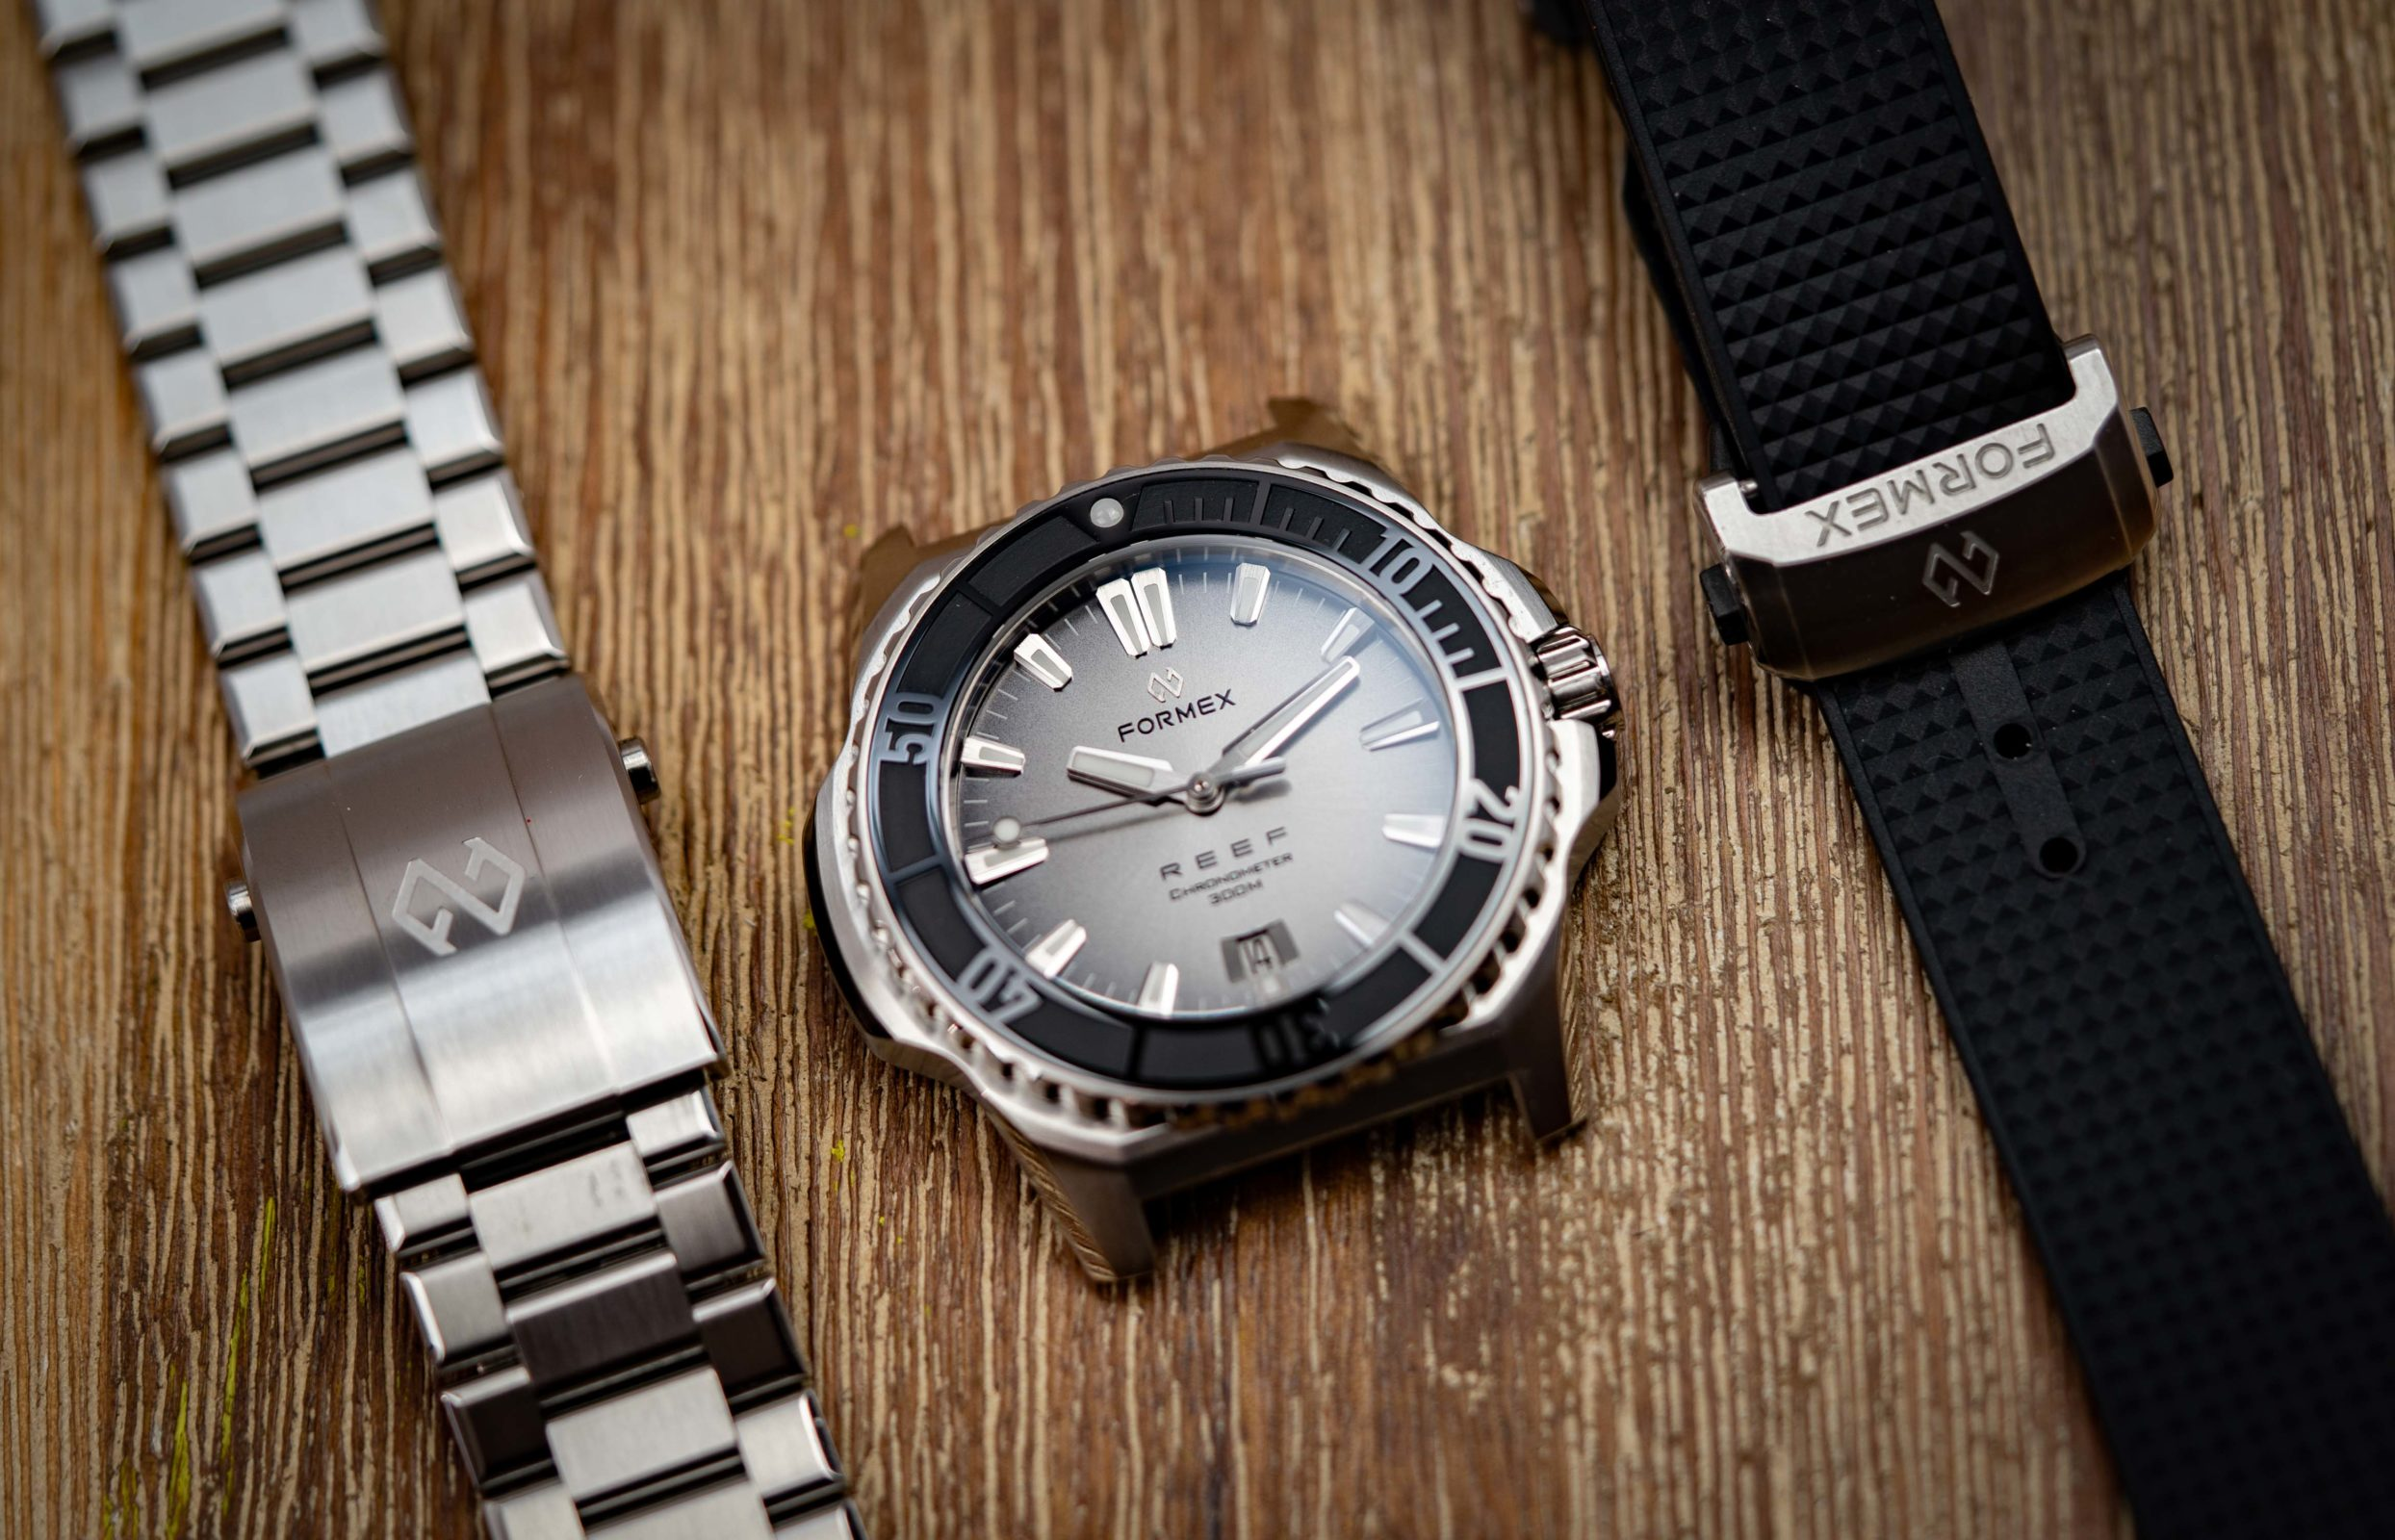 Formex-Reef-Automatik-Chronometer-300m-7